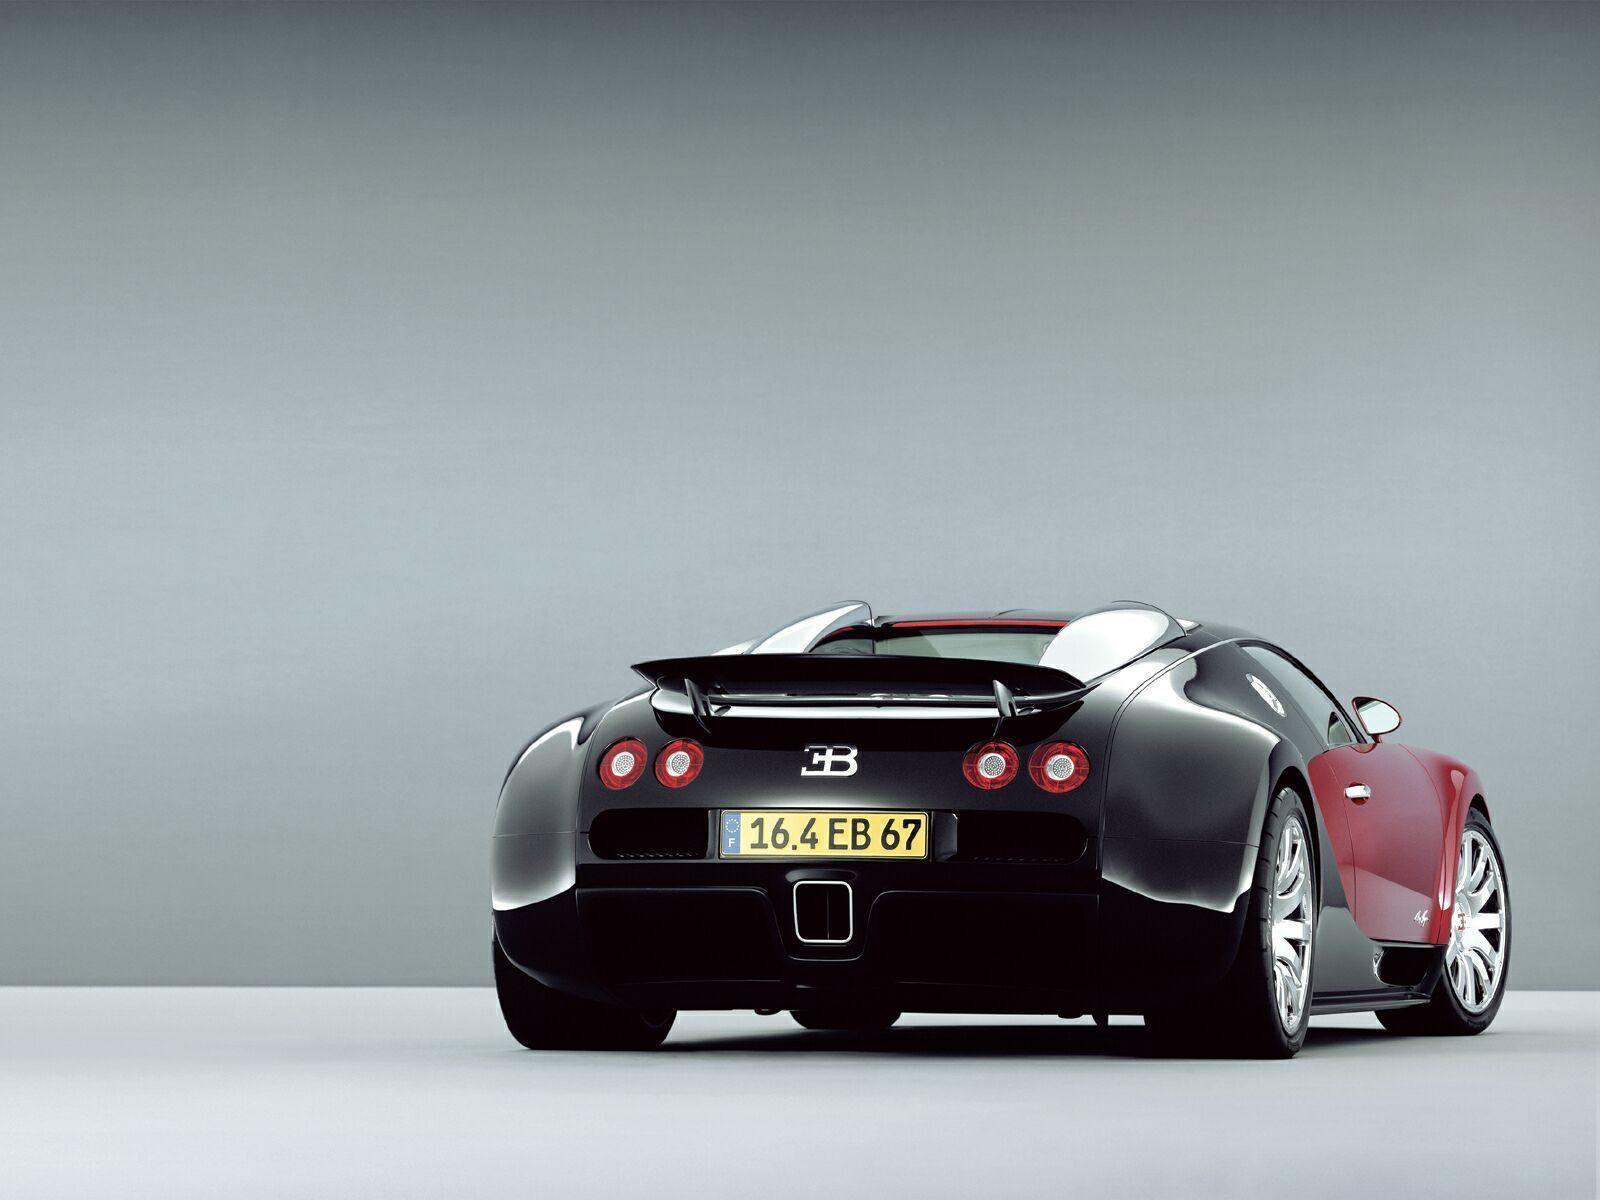 bugatti veyron hd wallpapers - Bugatti Veyron Wallpaper